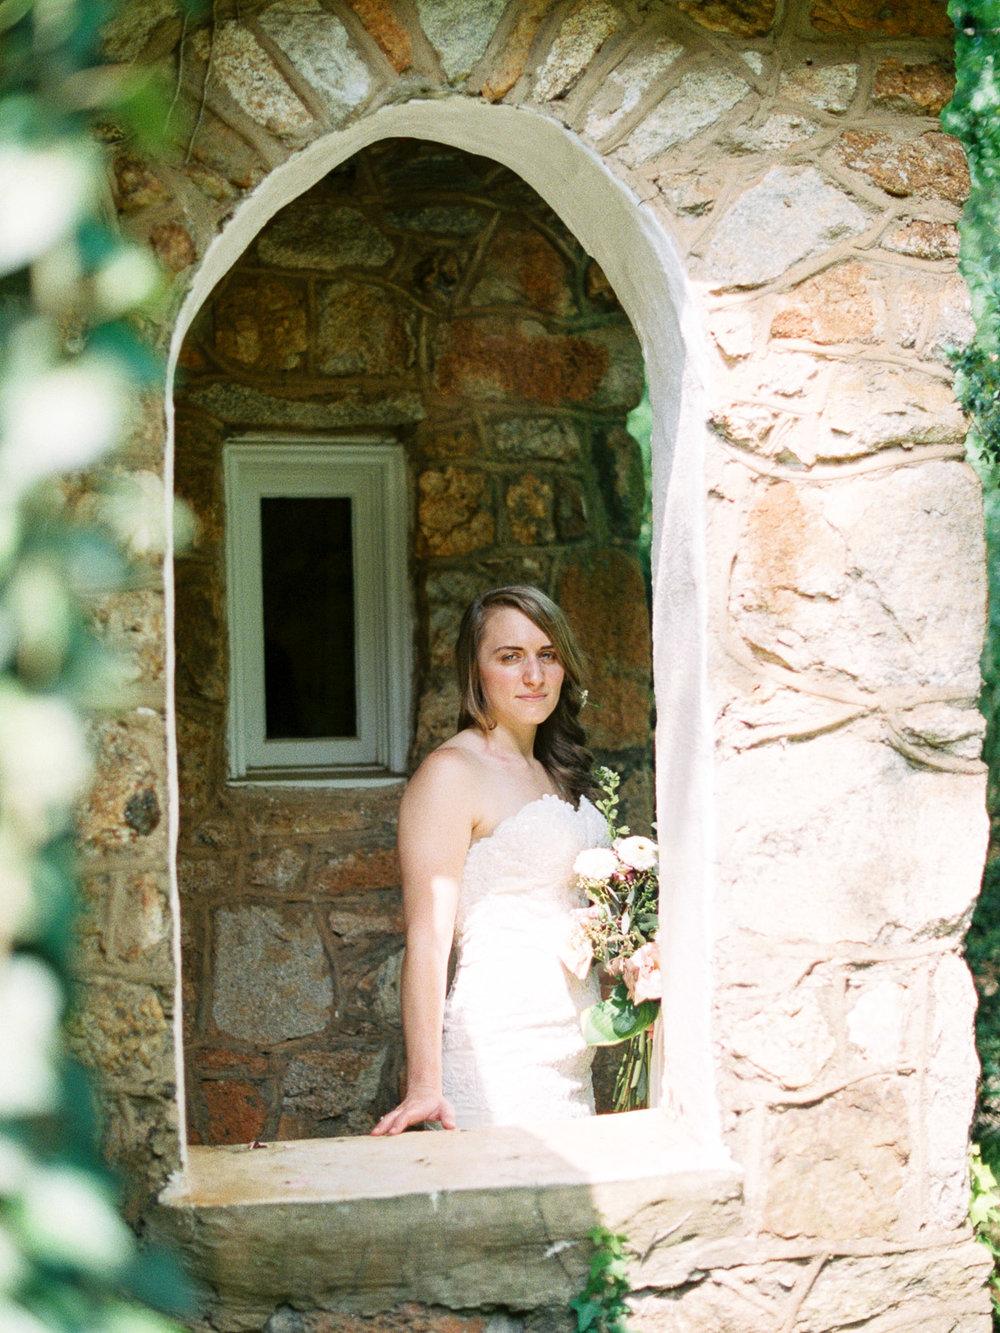 christinadavisphotography-romanticwedding-gardenweddinginspiration33.jpg